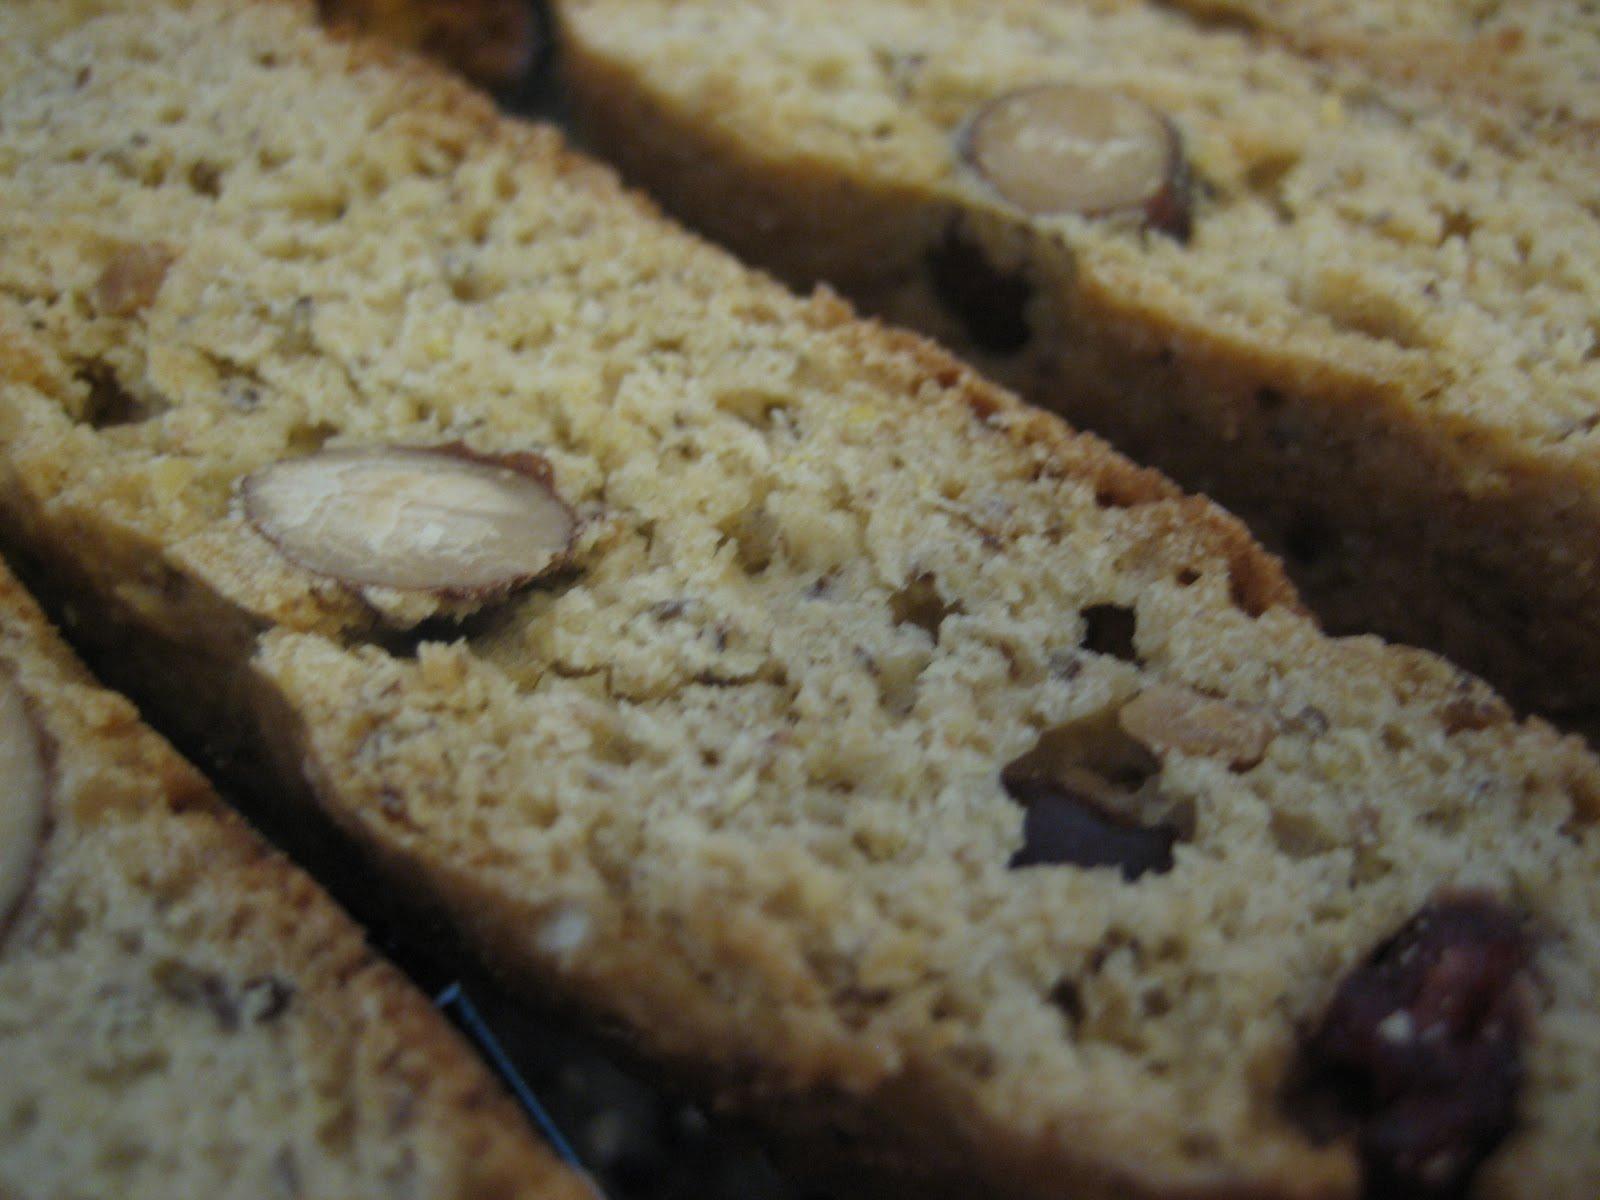 Lisa's Nutritious Kitchen Experiments: Honey Pistachio Biscotti